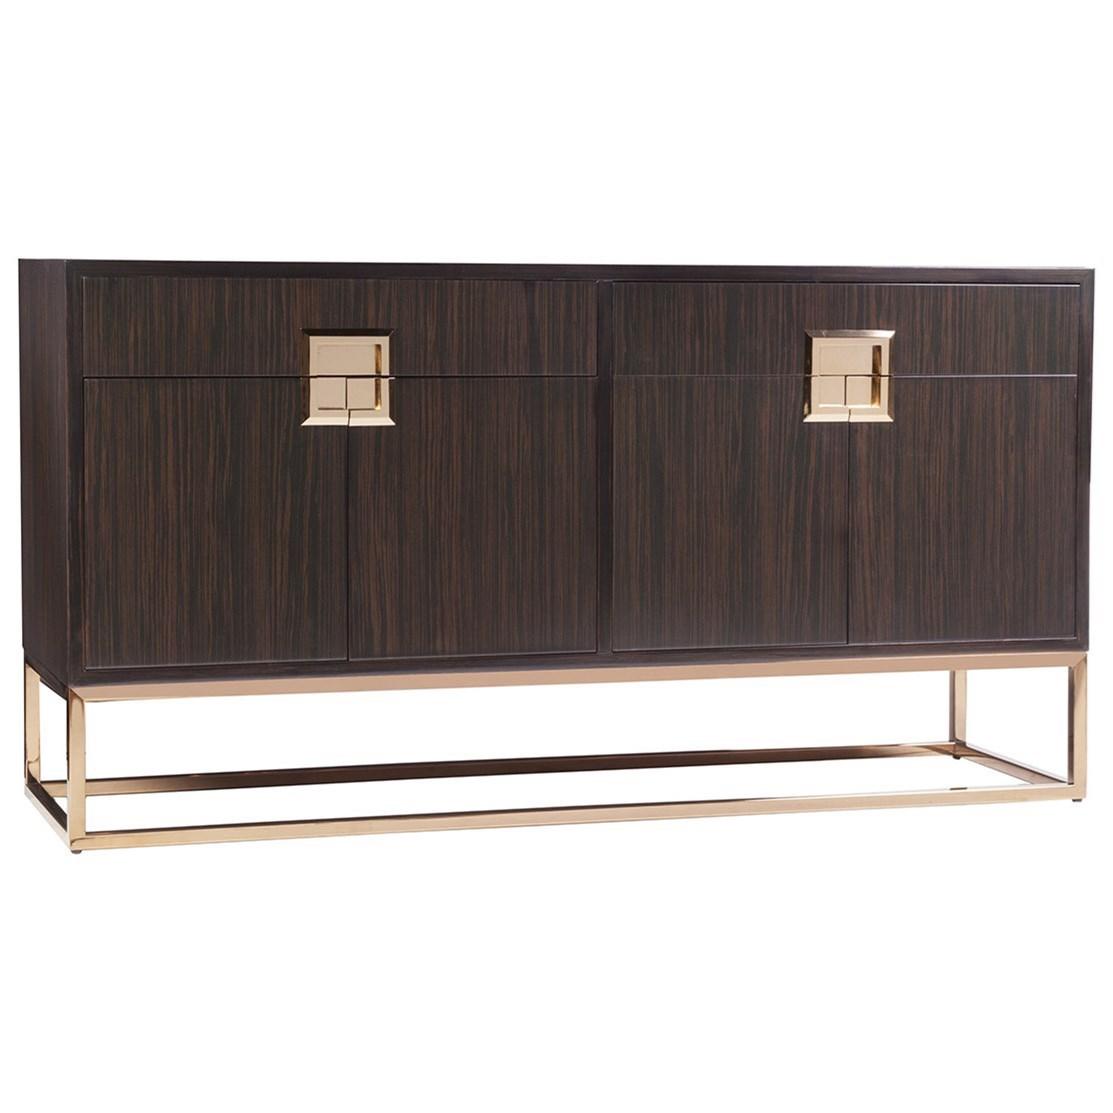 Casanova Sideboard by Artistica at Baer's Furniture